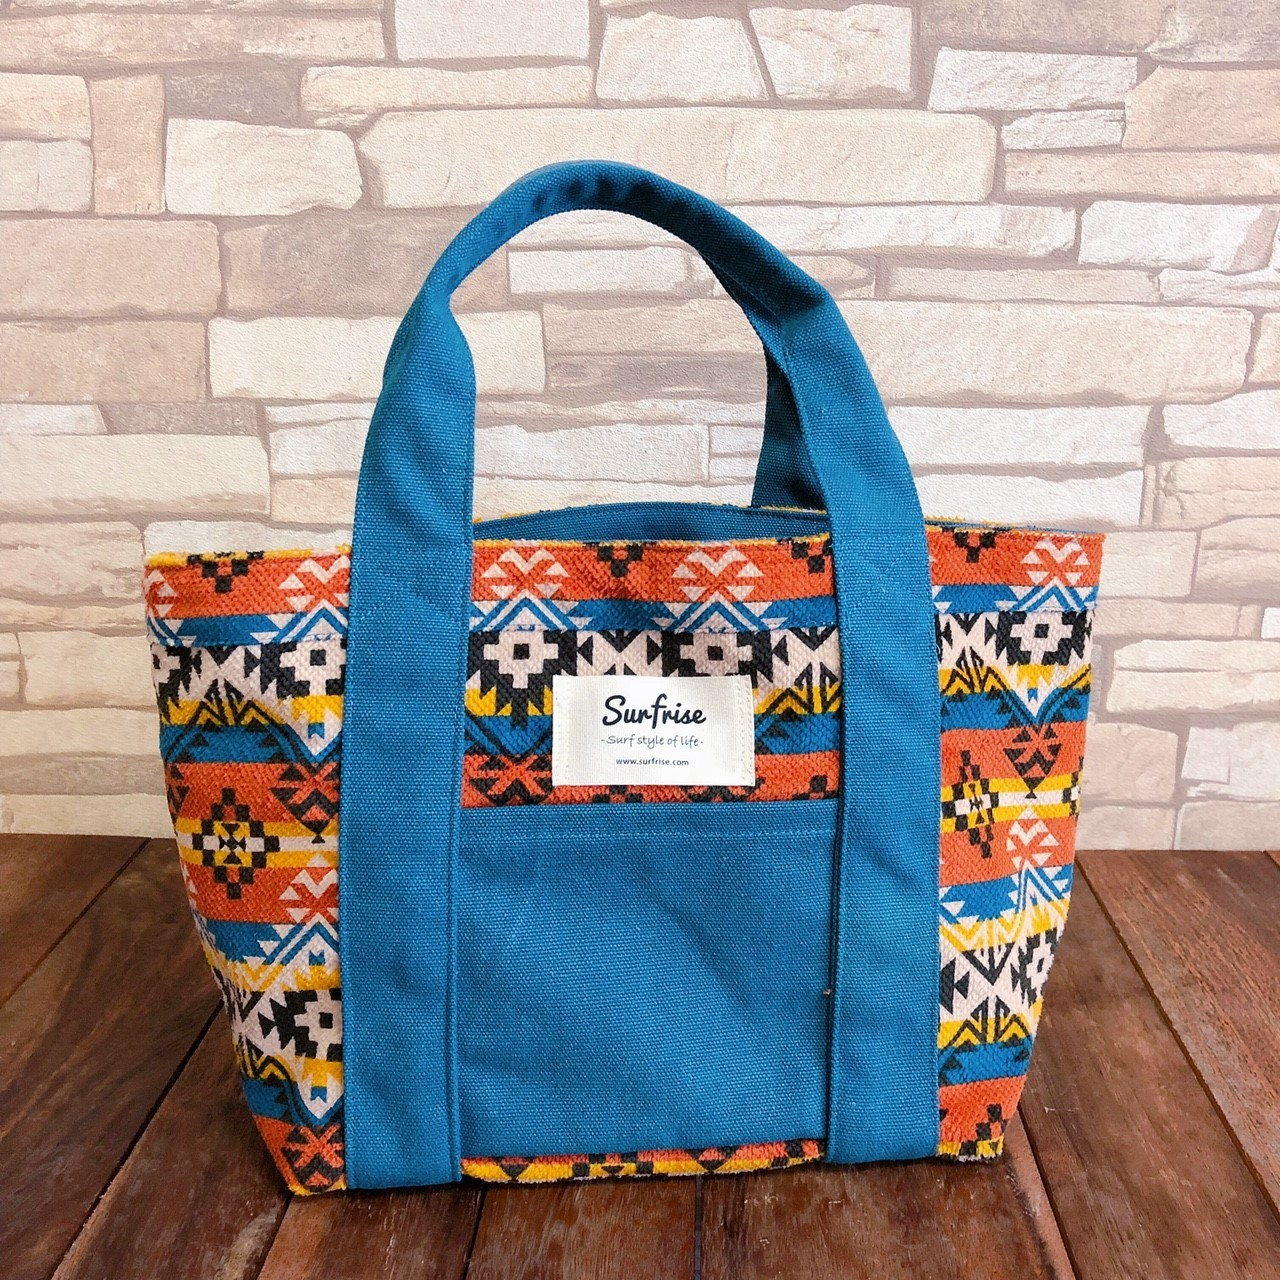 Camp Tote bag S - Blue